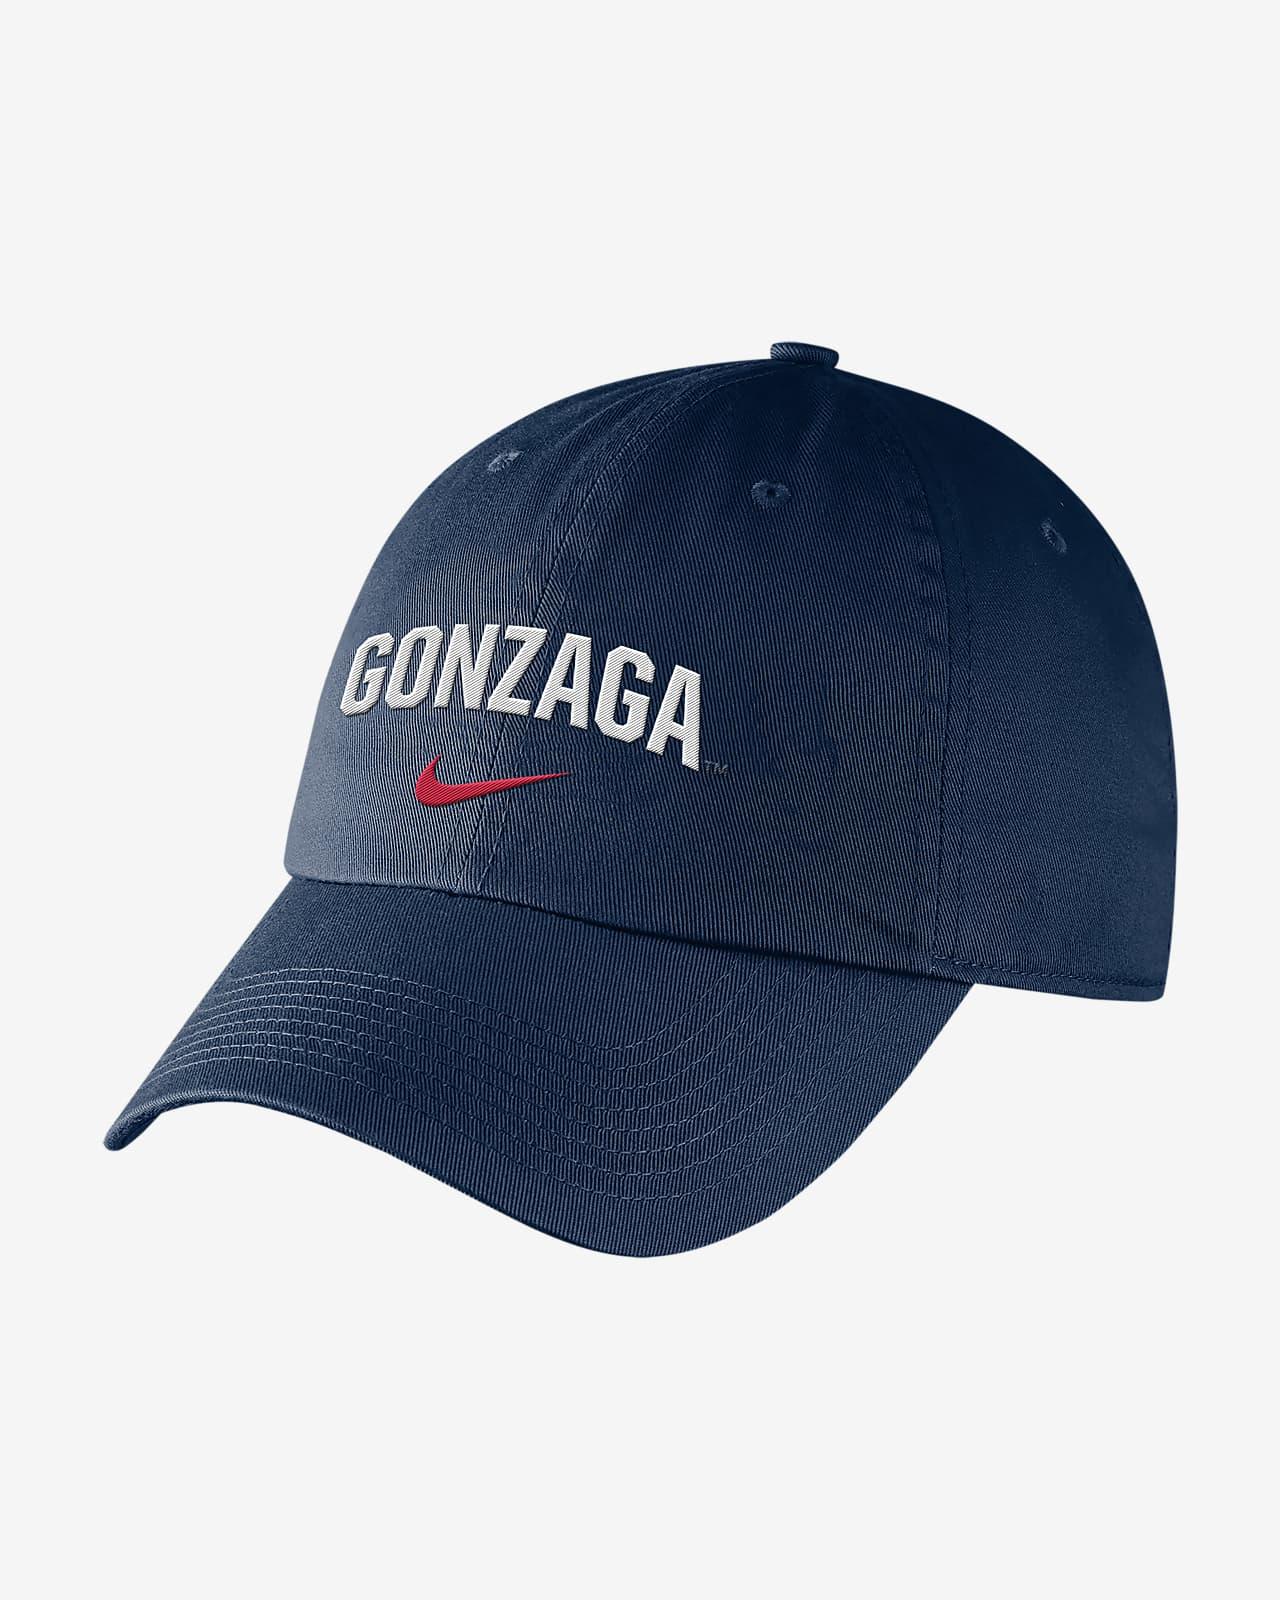 Nike College (Gonzaga) Hat